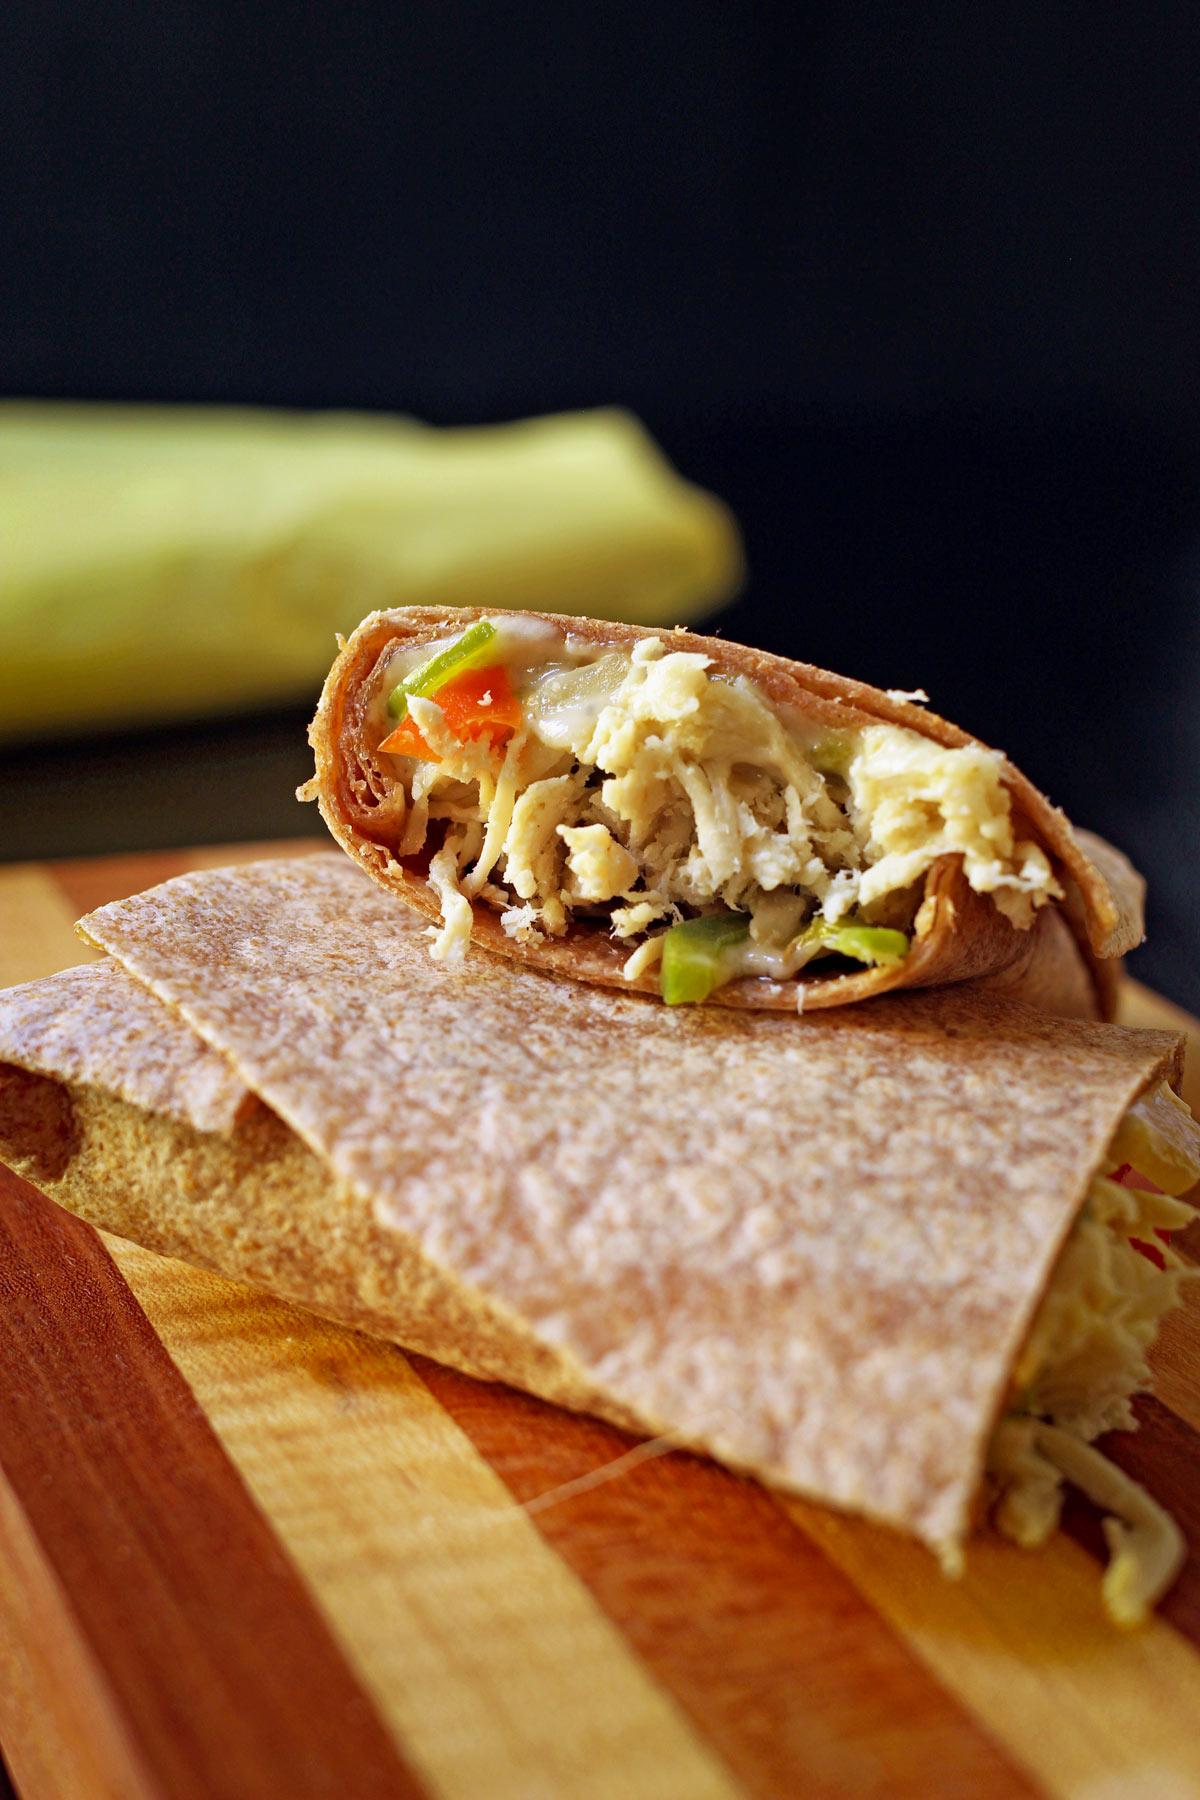 close up view of the cut side of a fajita burrito bursting with shredded chicken, fajita veggies, and cheese.